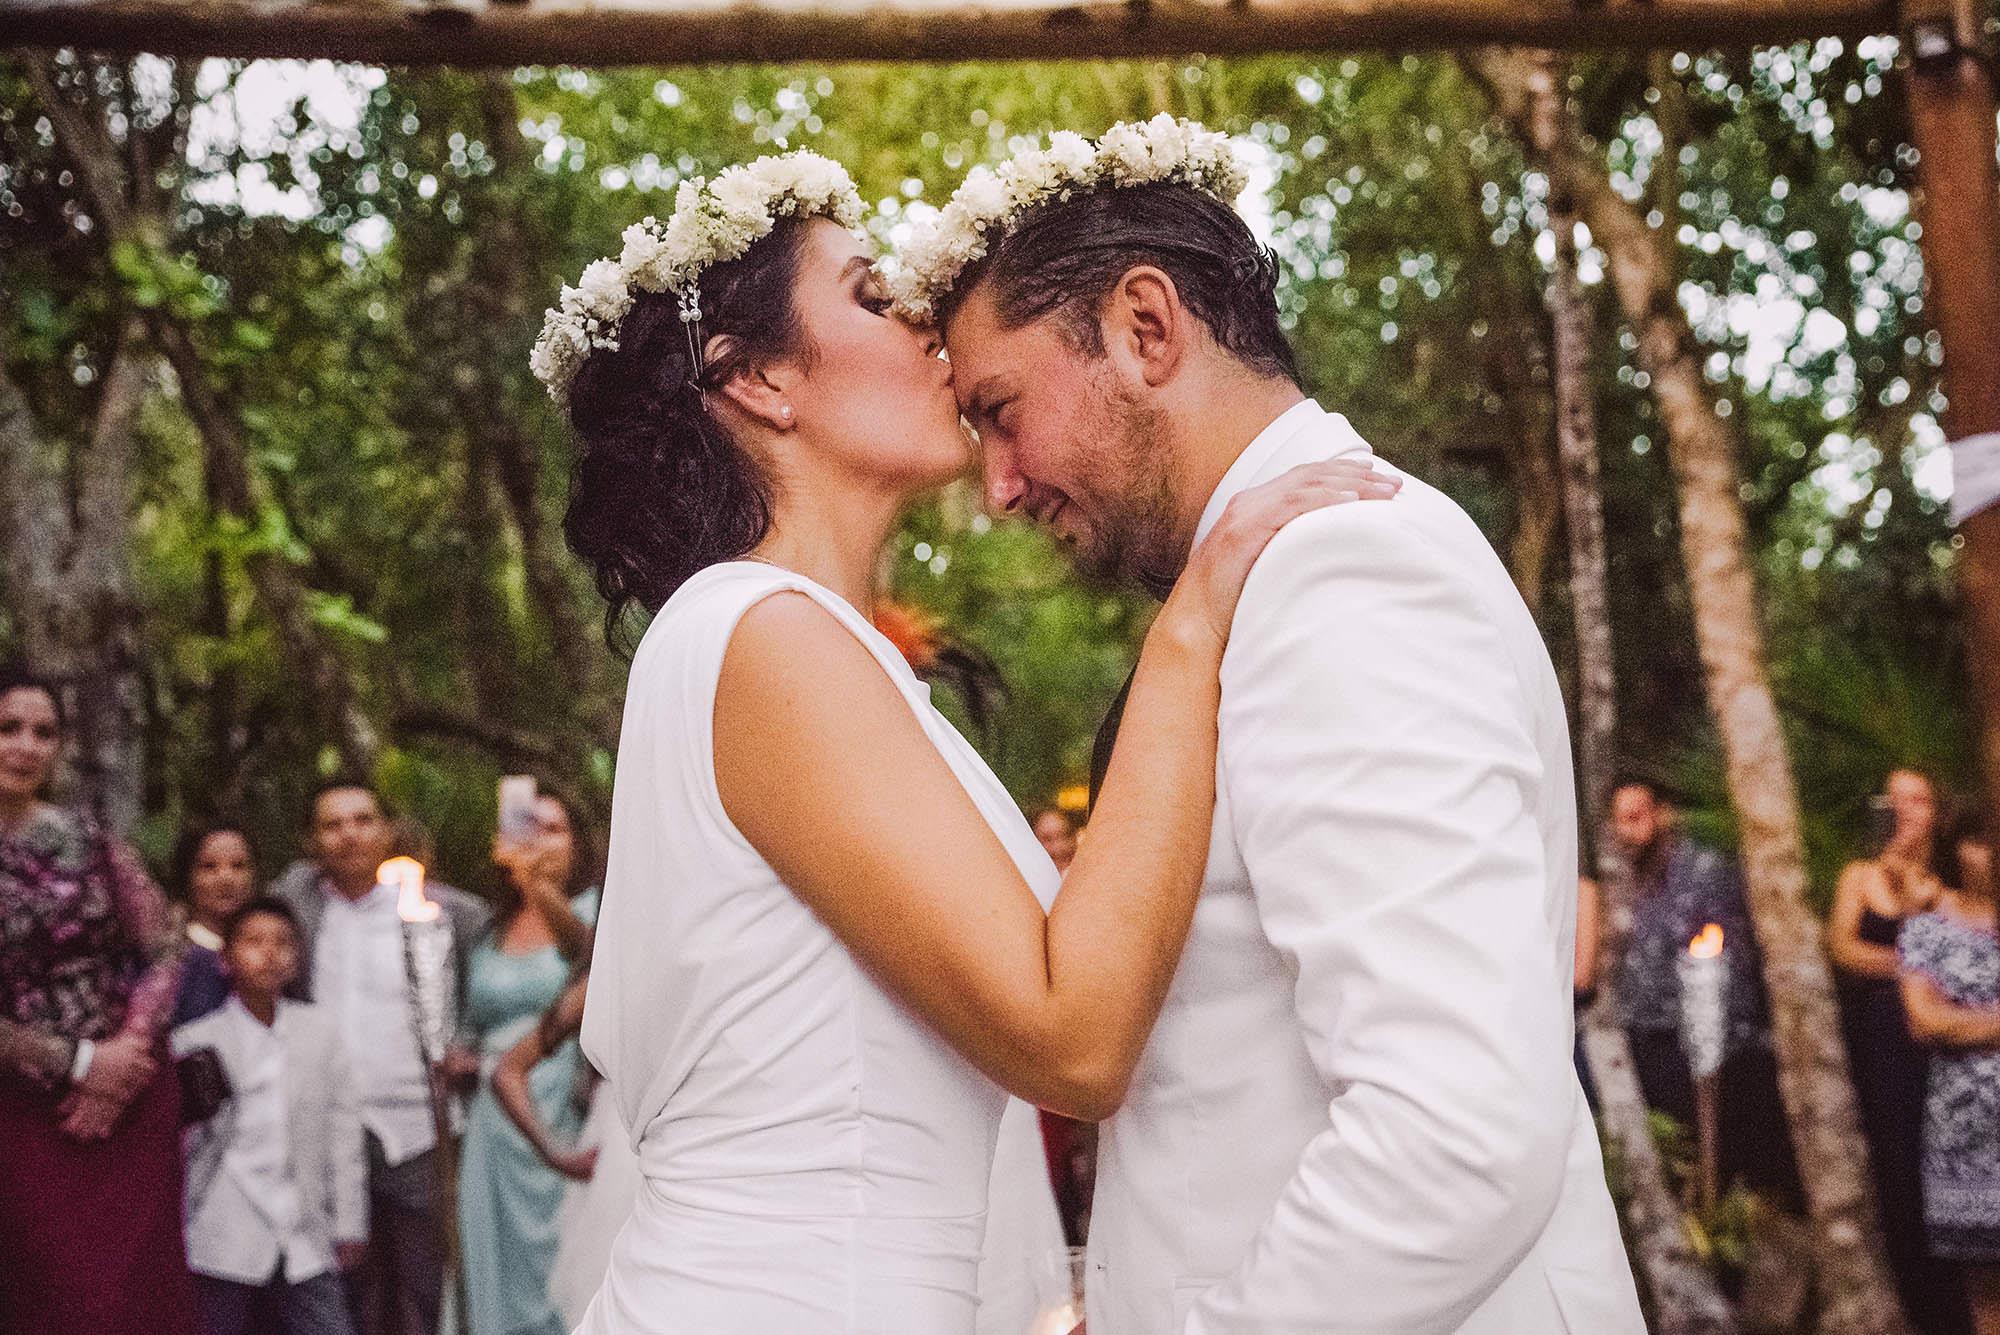 Wedding playa del carmen planner destination mexico magali espinosa40-WEB.jpg